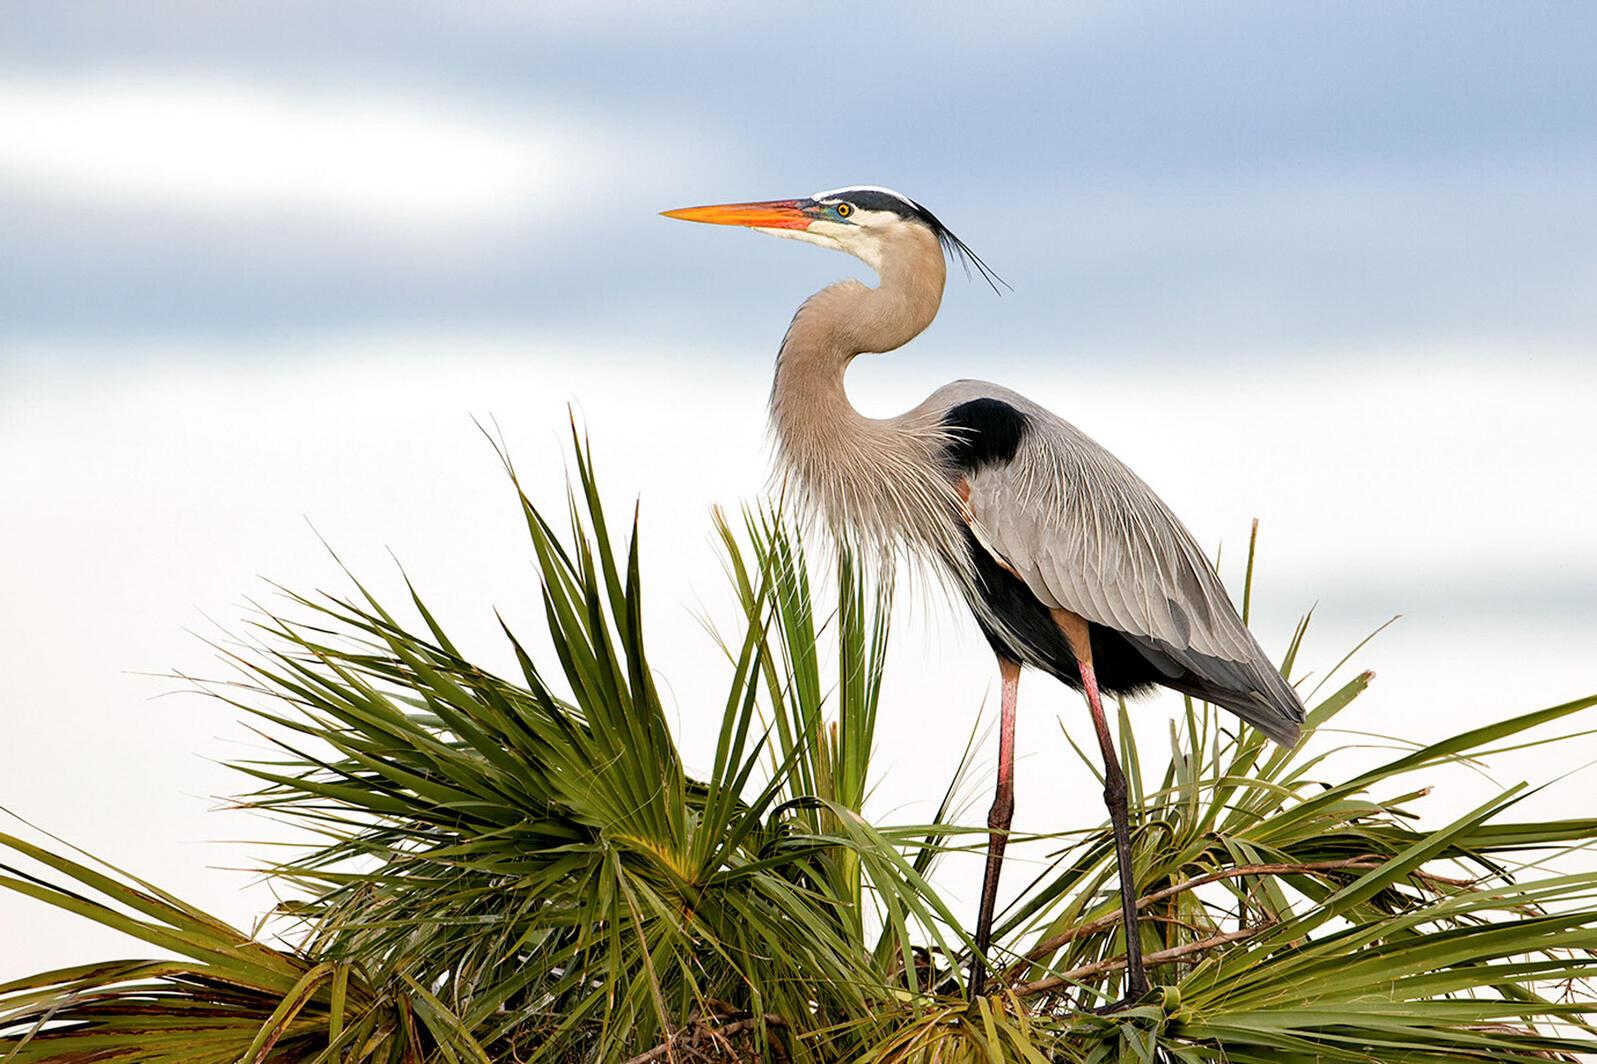 Great Blue Heron. Michael Libbe/Audubon Photography Awards